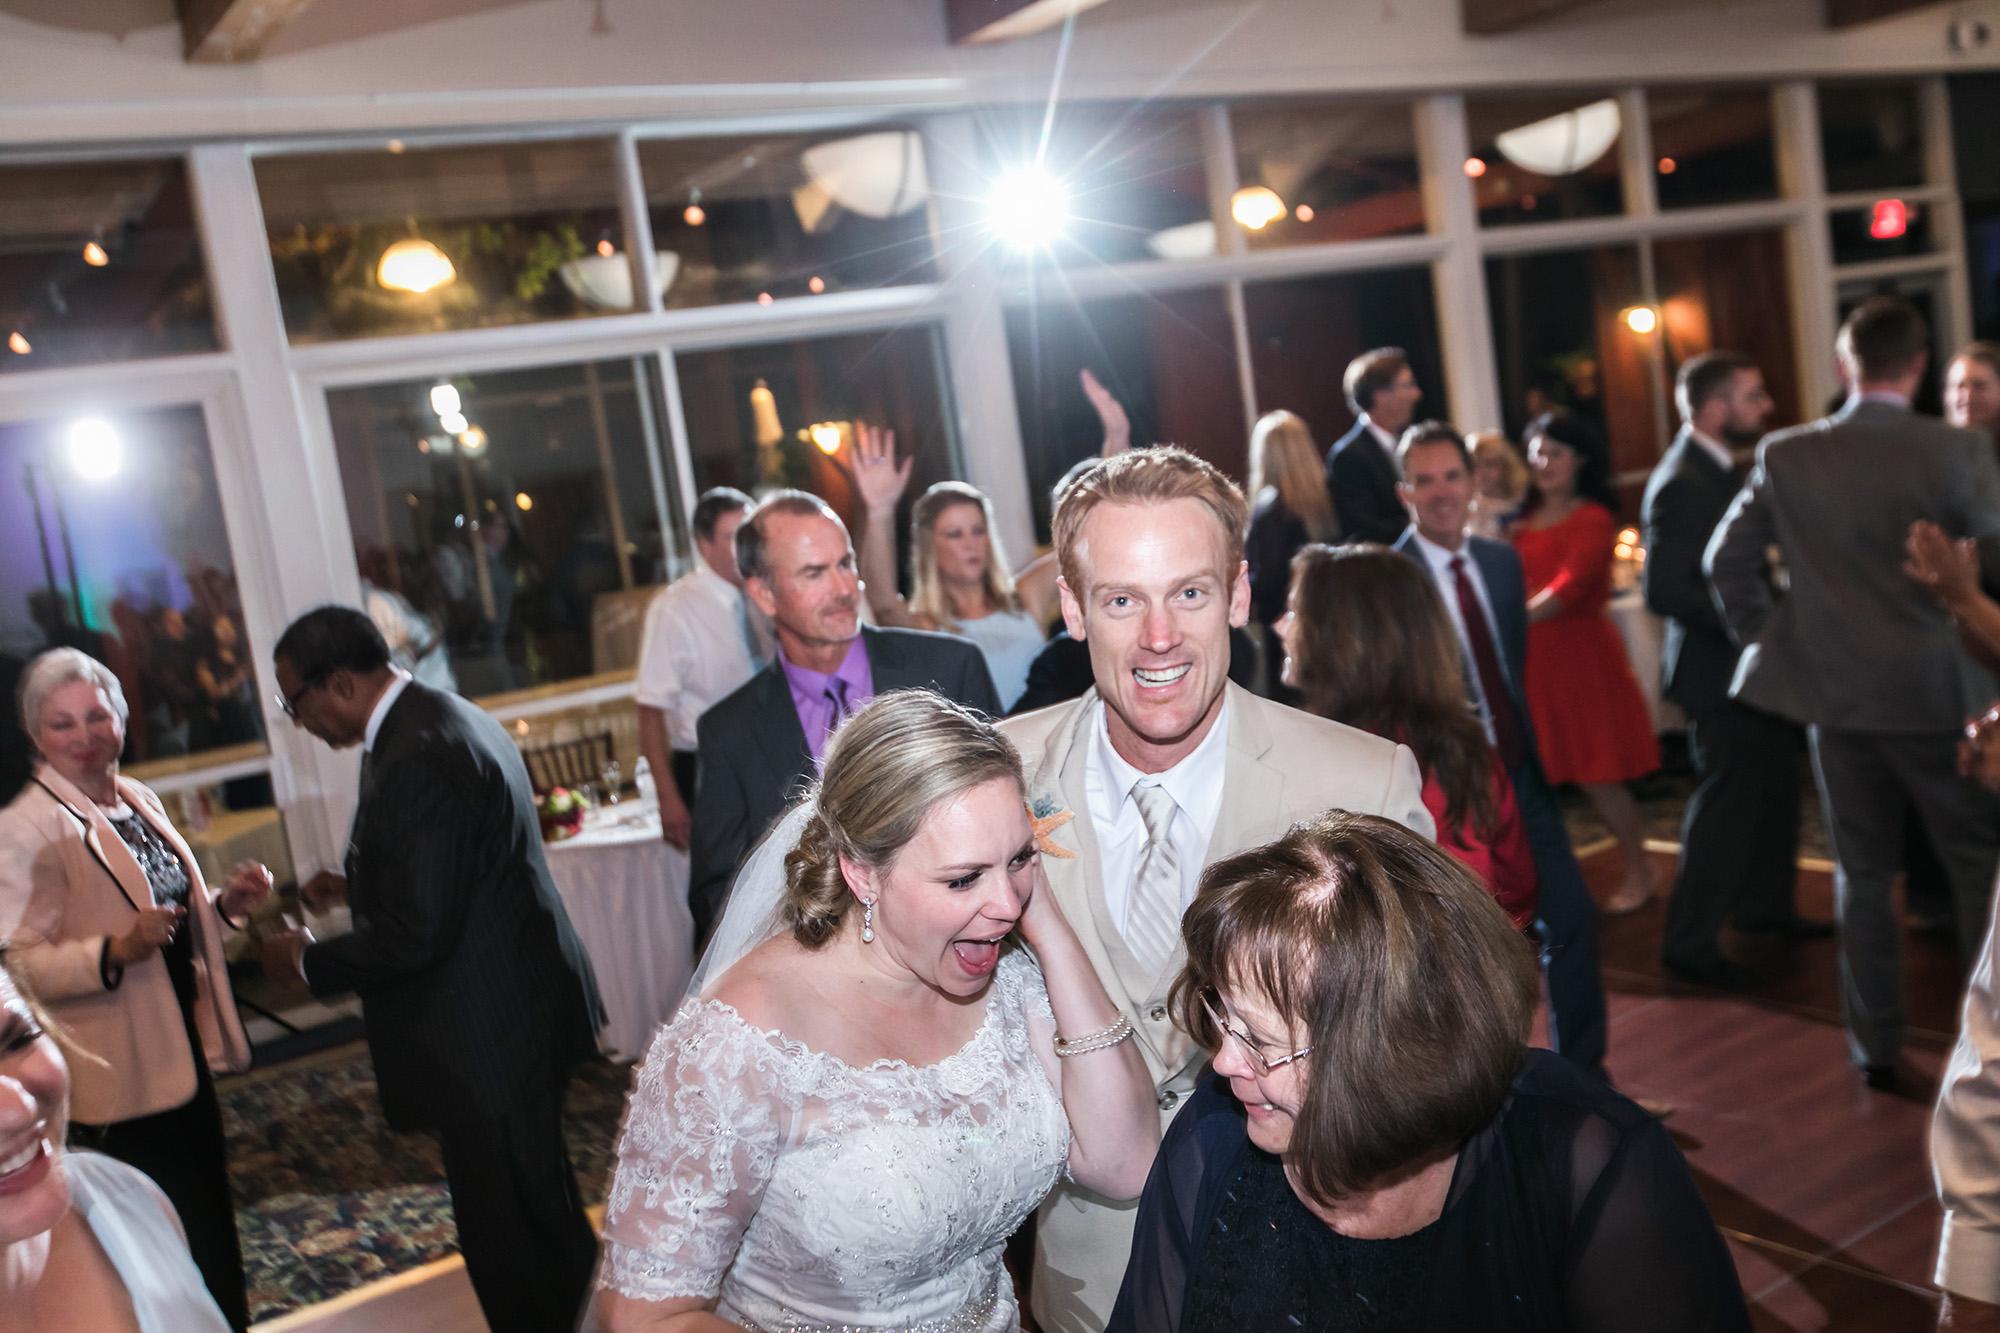 unforgettable-st-monica-wedding-carrie-vines-photography-106.jpg